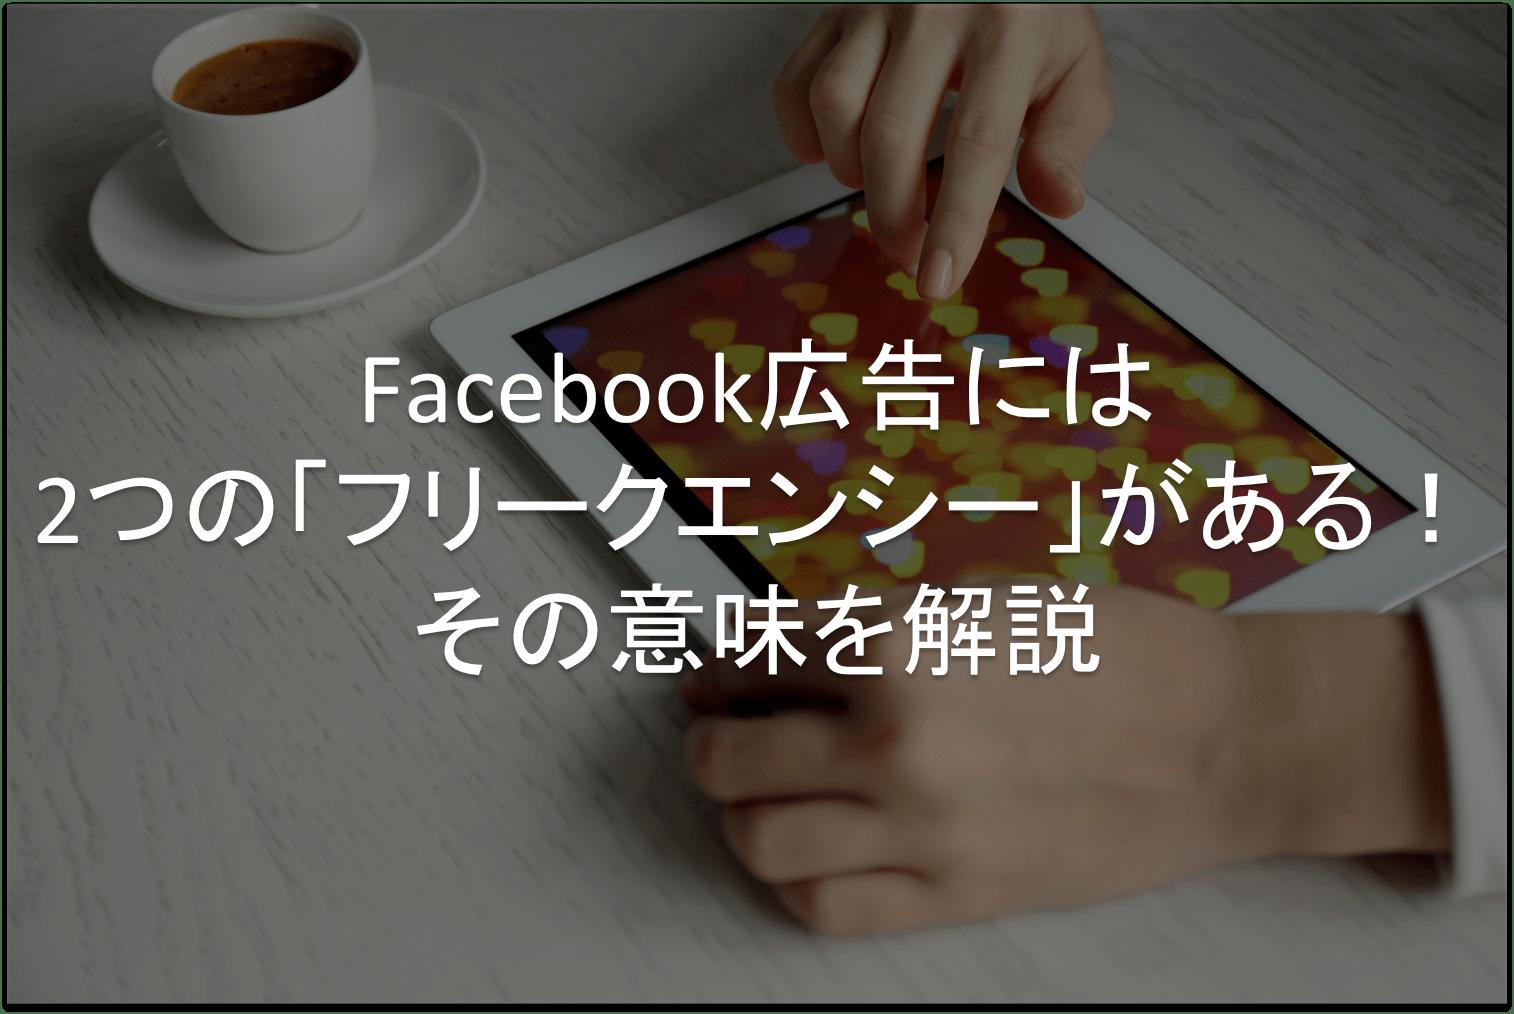 facebook広告 フリークエンシー